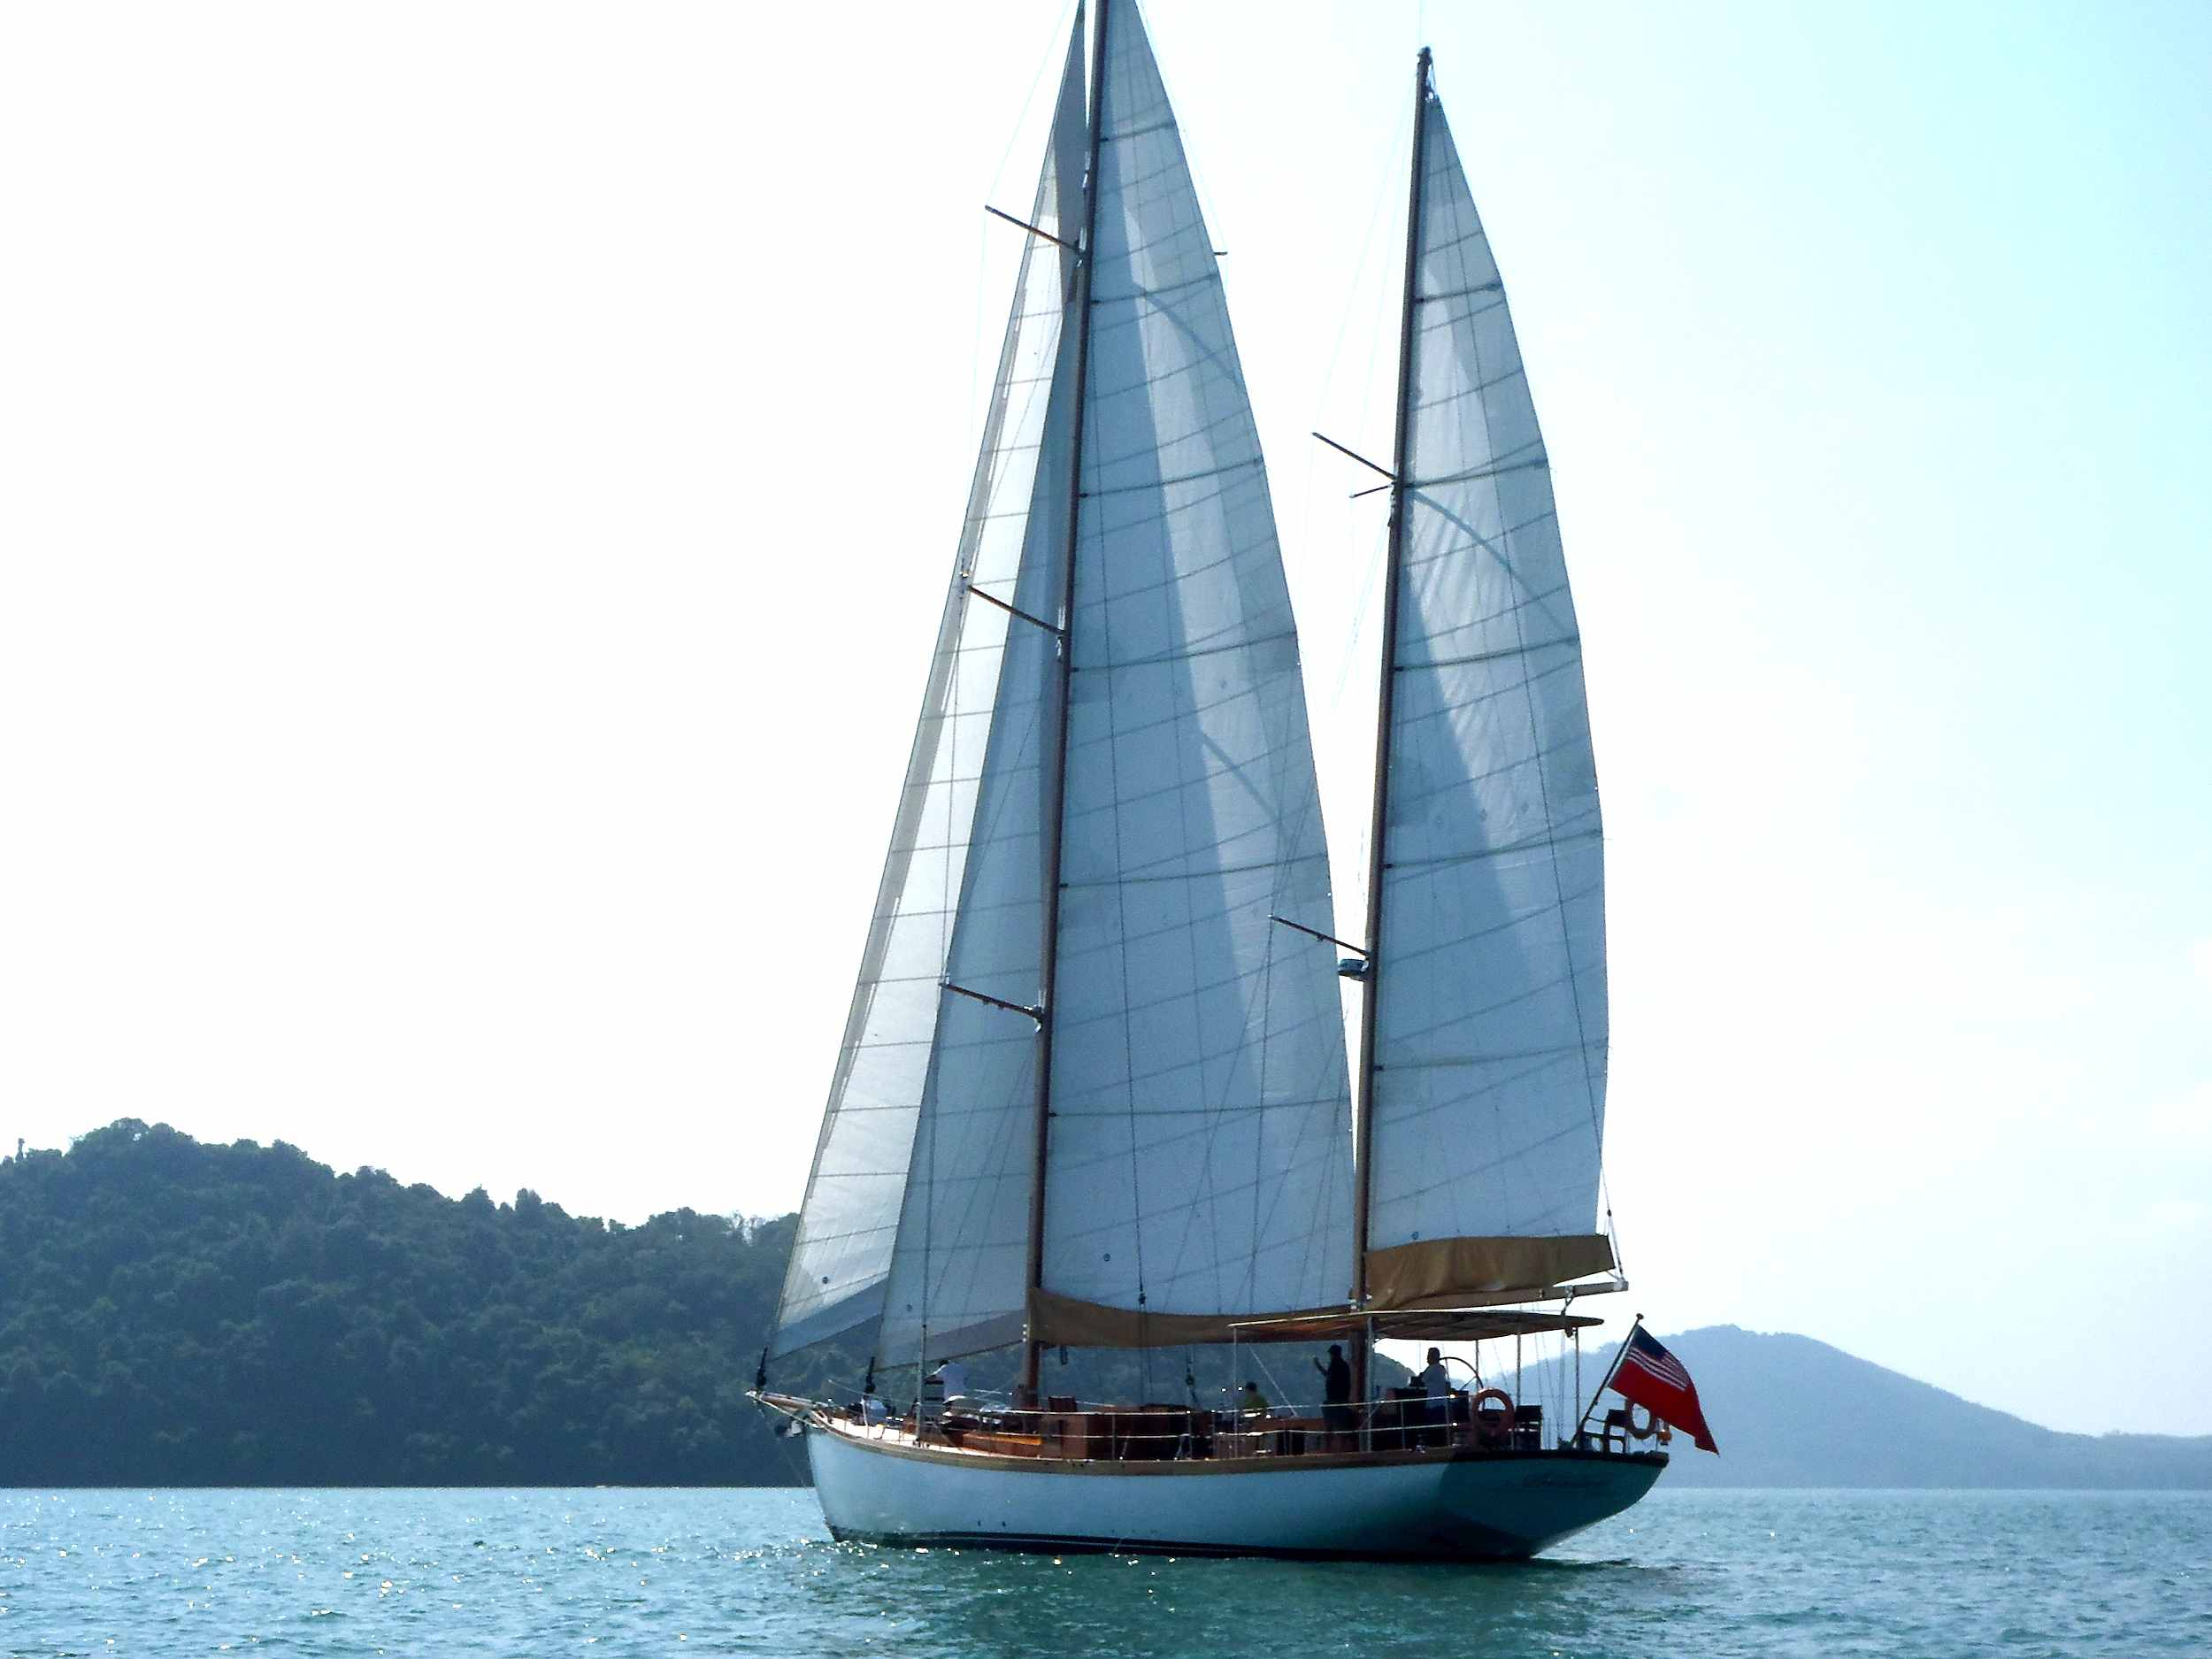 Aventure yacht Mergui Burma sailingholiday beaches.jpg